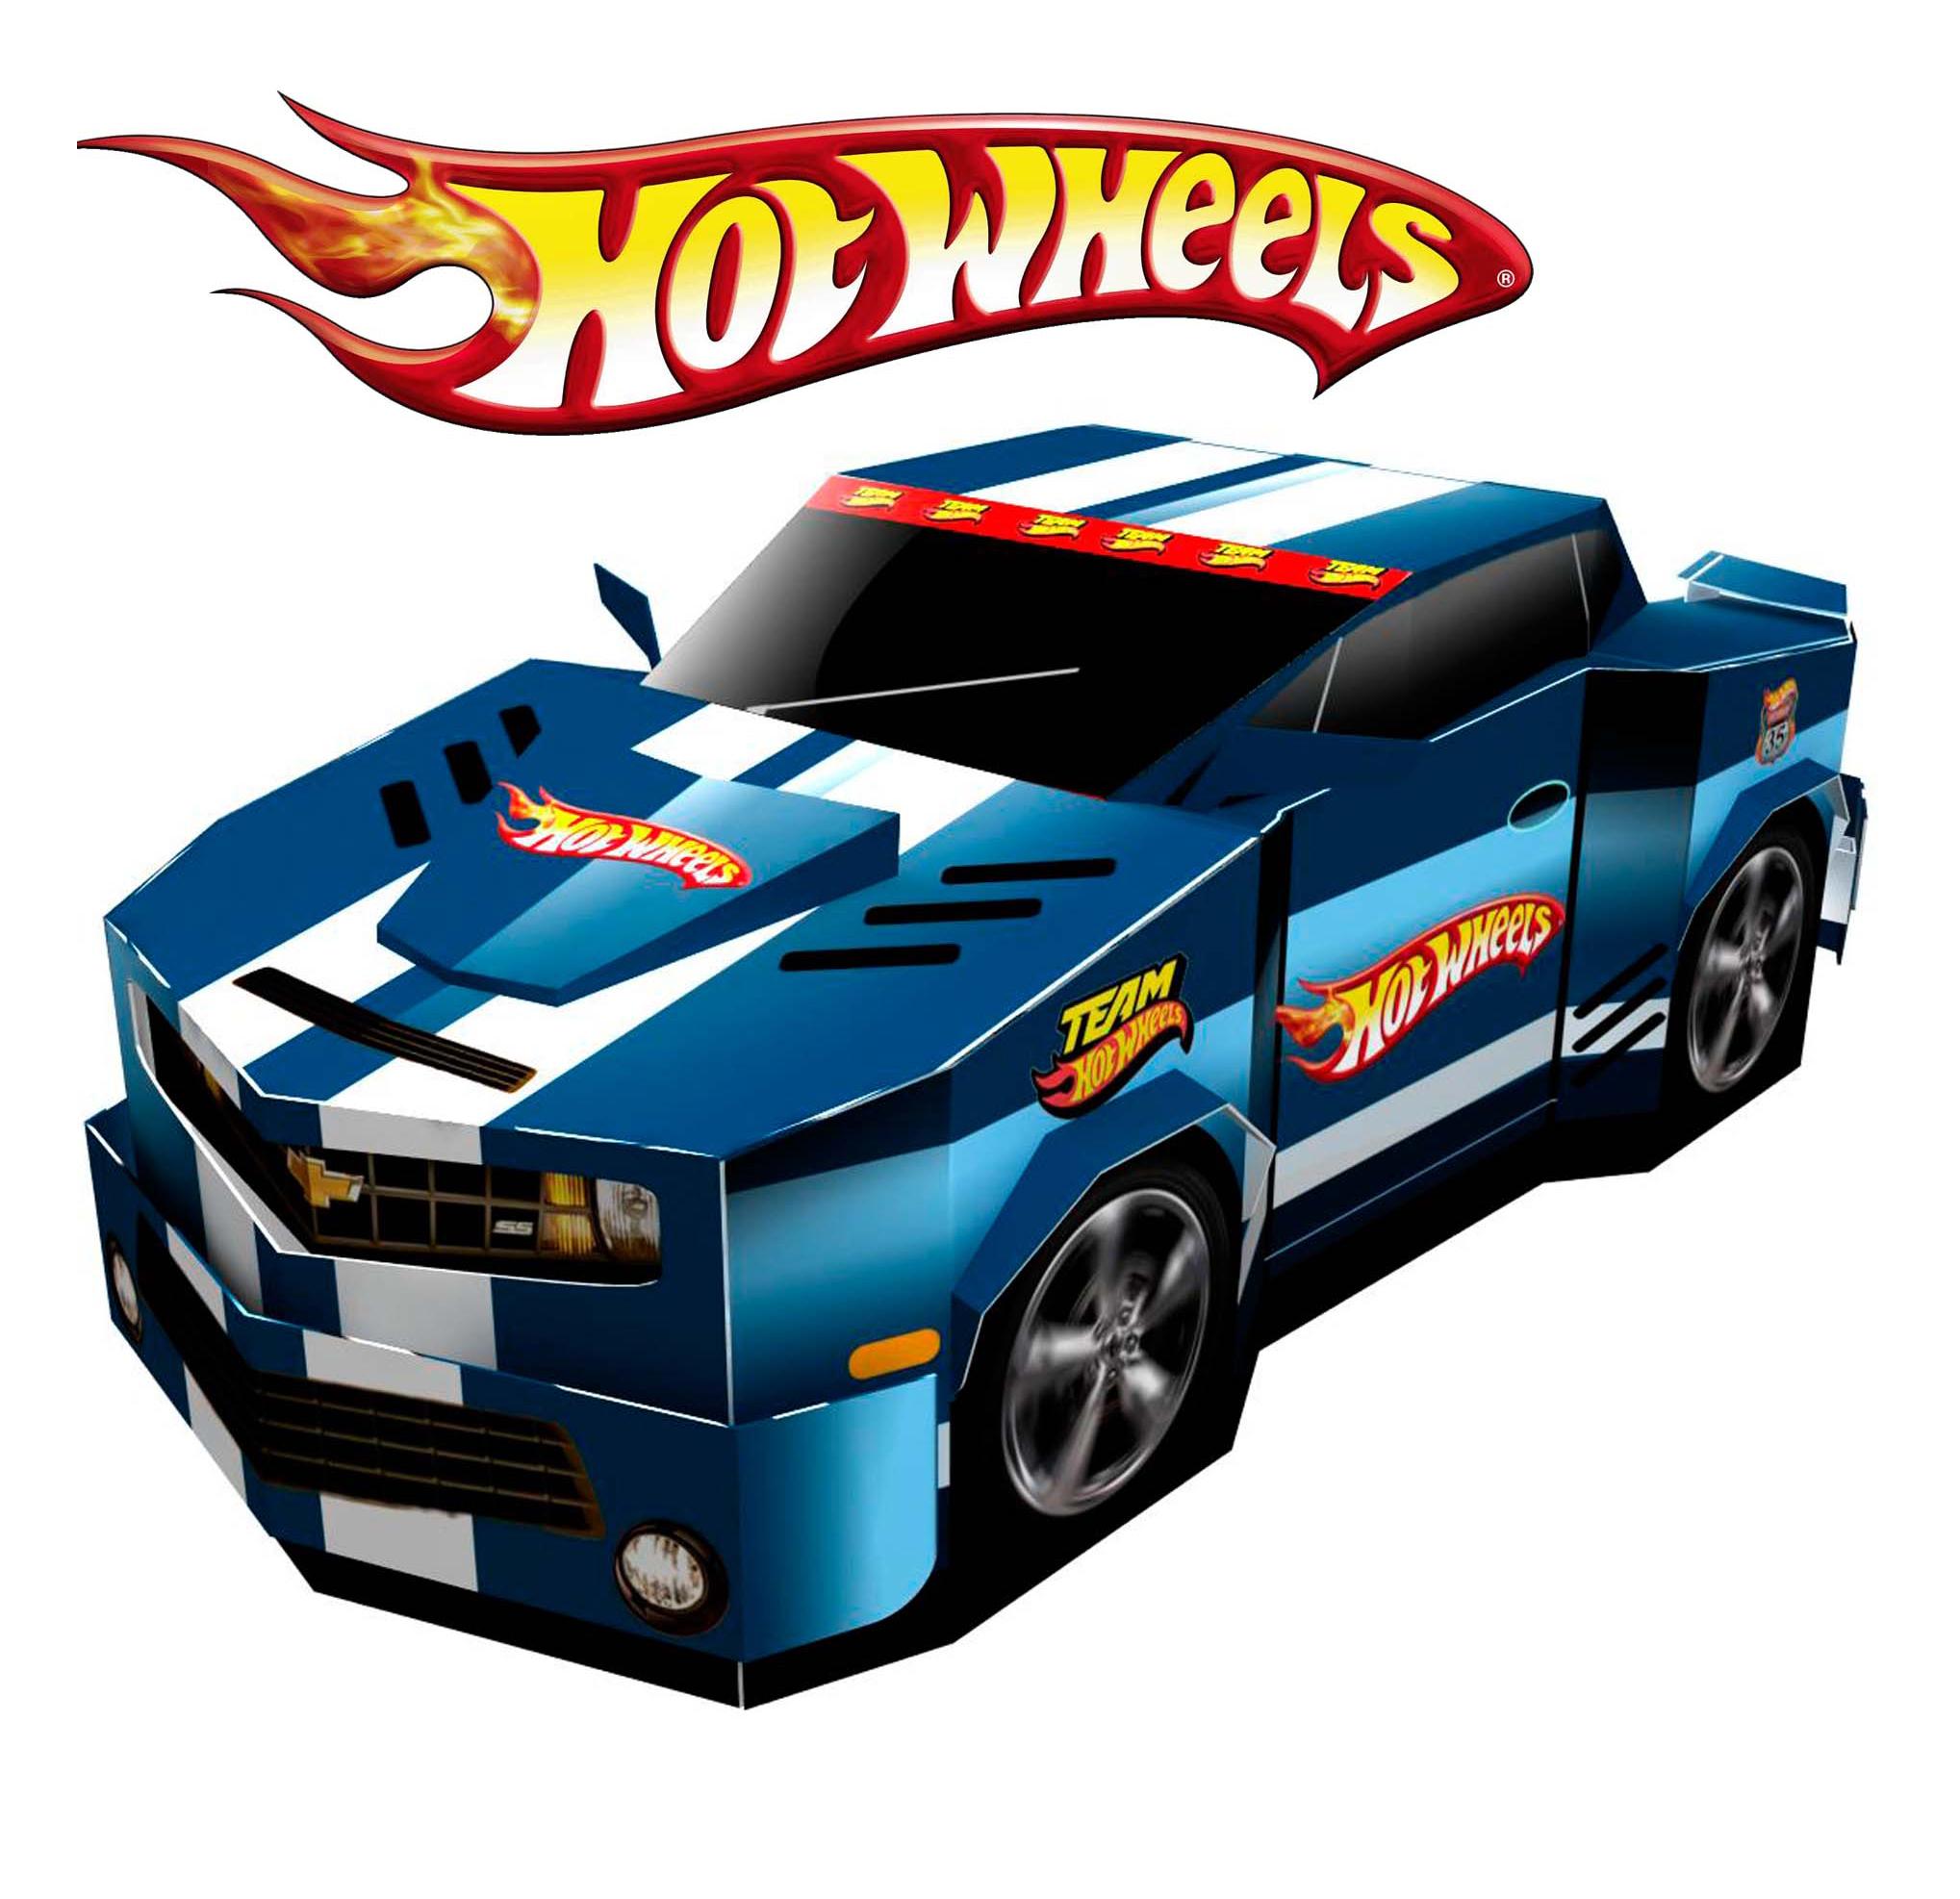 2037x1974 Green Toys Car Hot Wheels Clipart